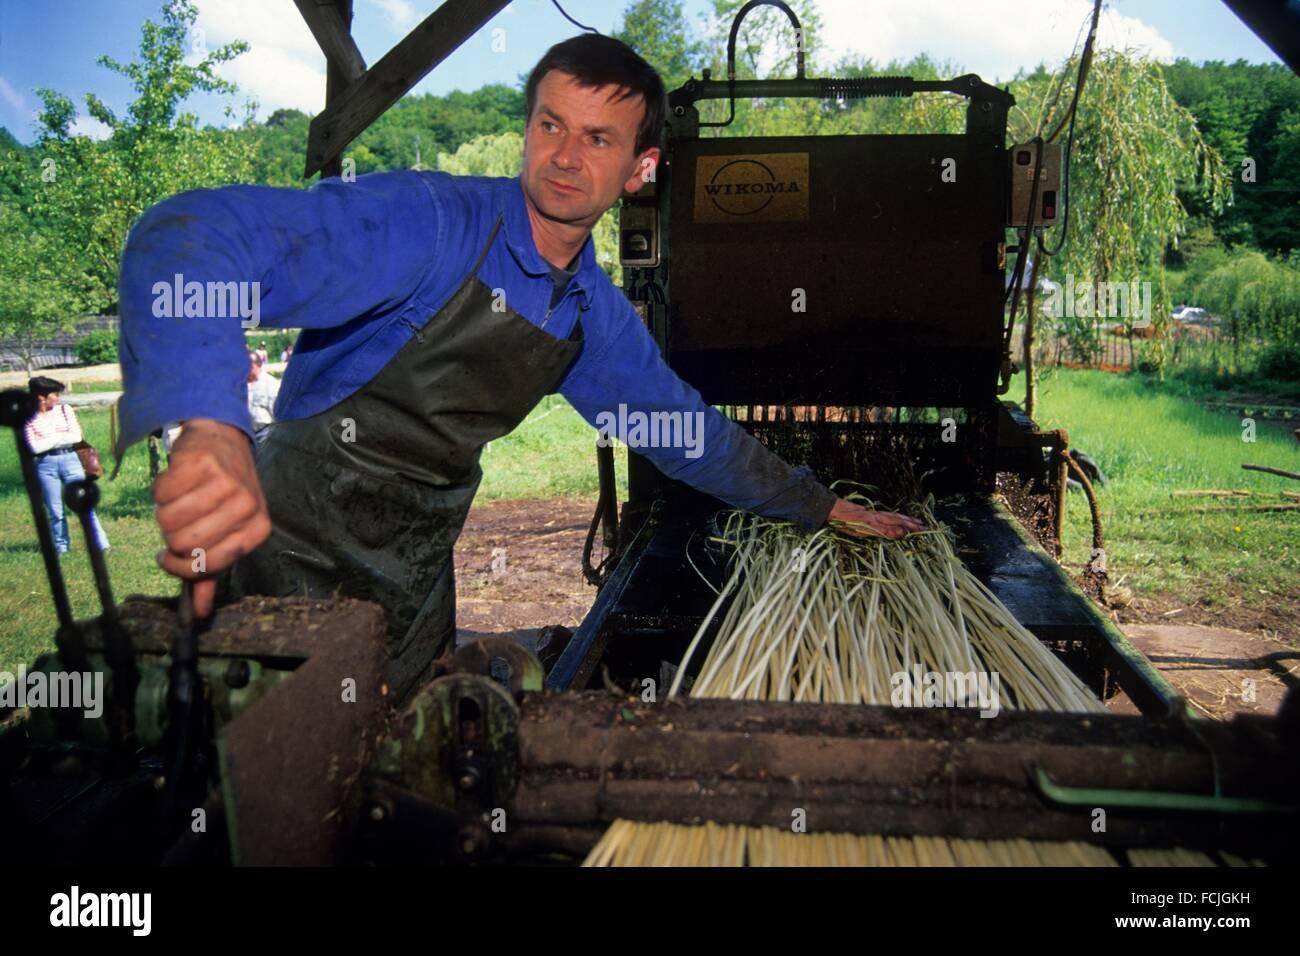 mechanical barking of willow stems, Villaines-les-Rochers, Indre-et-Loire department, Centre region, France, Europe. - Stock Image